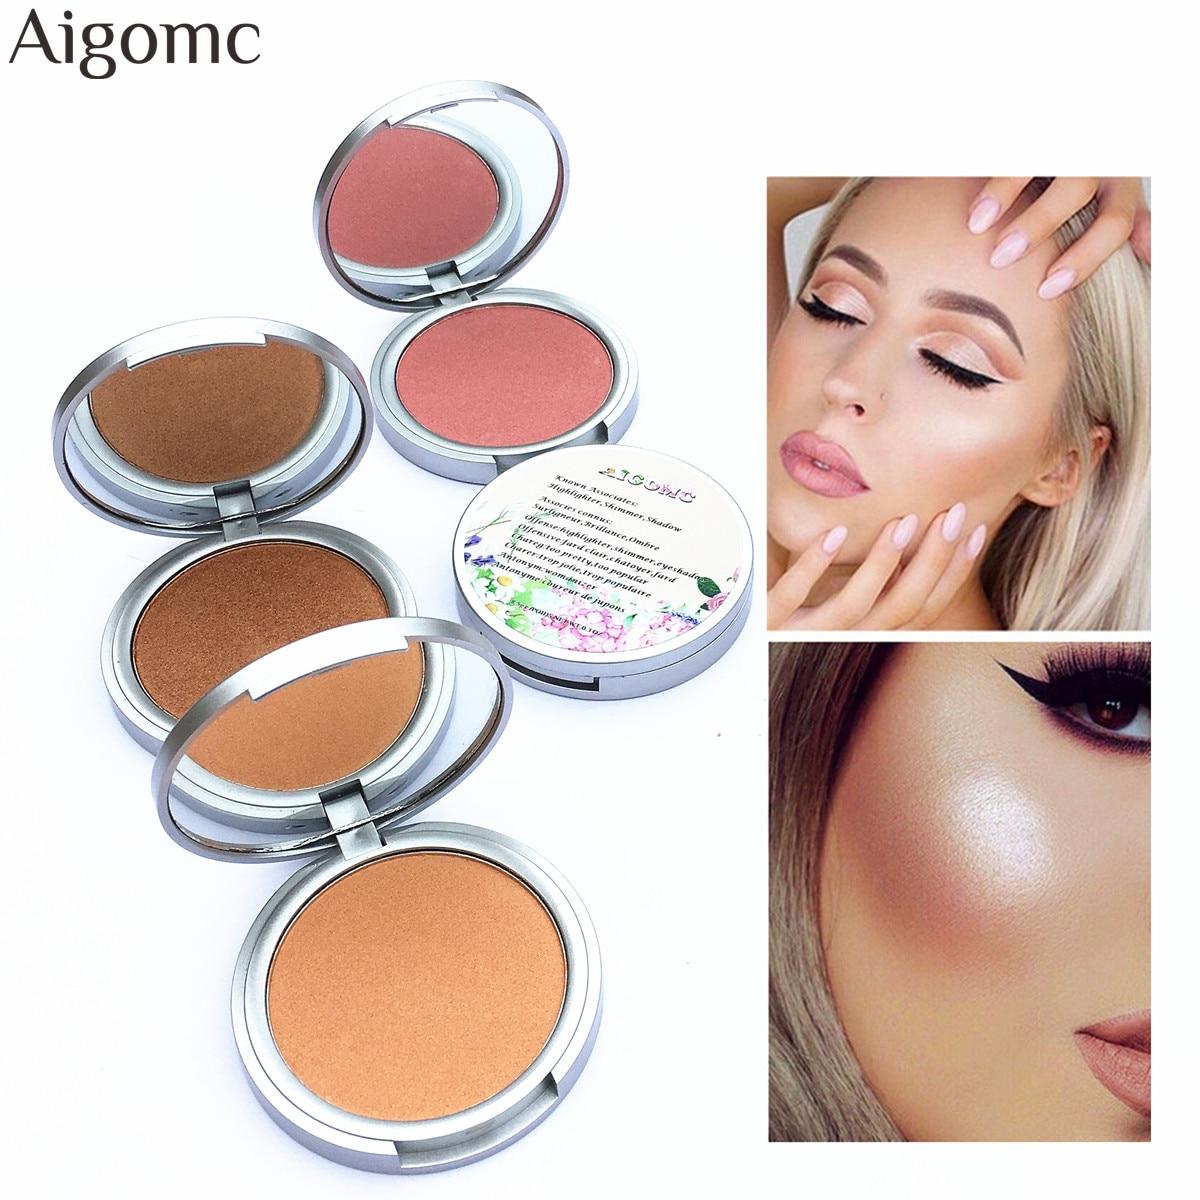 Aigomc Brand Face Highlighter Powder Palette Makeup Shimmer Highlight Make Up Powder Cosmetics